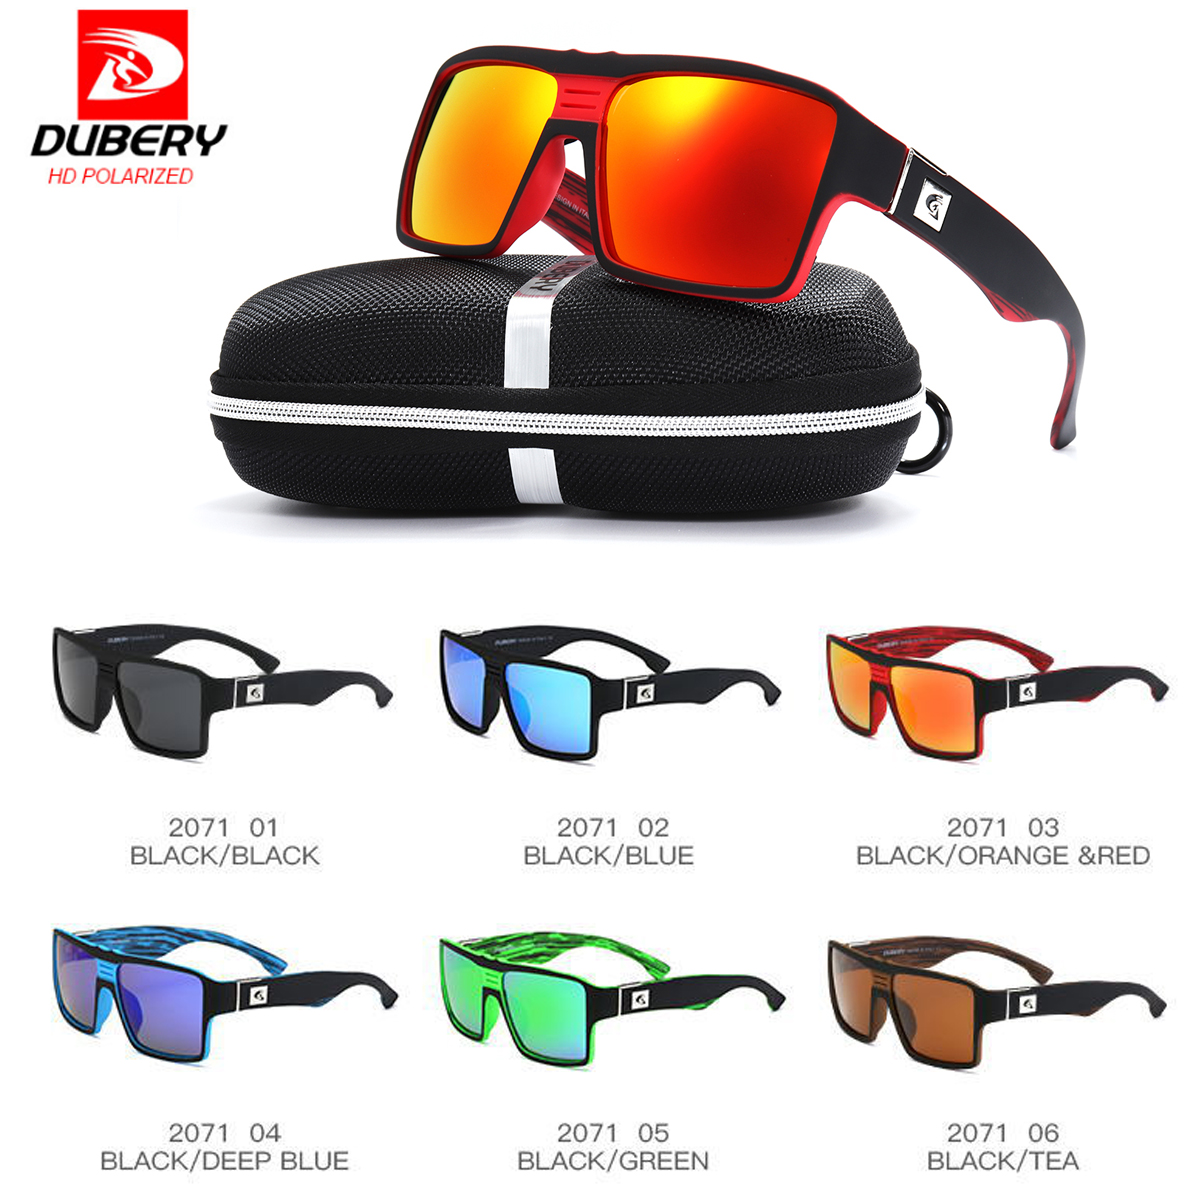 93155e4eca6b Detail Feedback Questions about DUBERY D729 Cycling Glasses Men Women  Polarized Sunglasses Bike Eyewear Bicycle Goggles Driving Fishing Outdoor  Sports ...